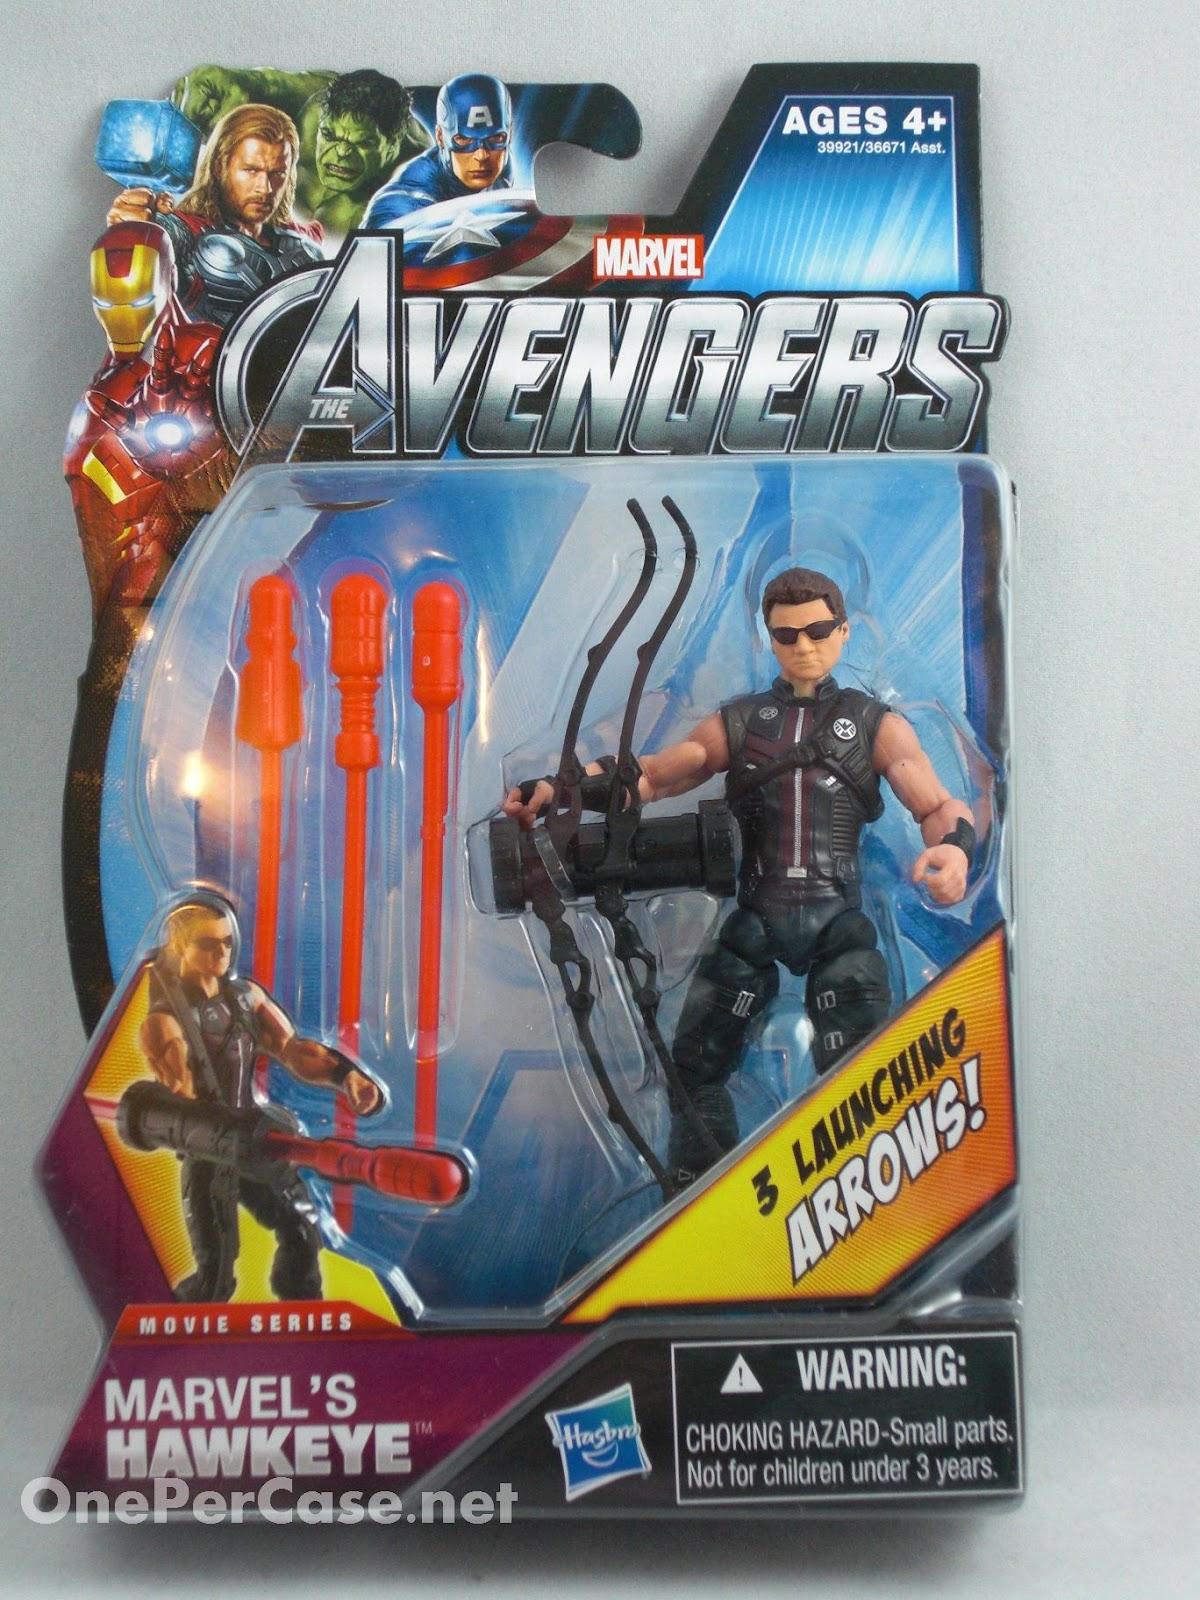 The Avengers: The Avengers Movie Series Hawkeye